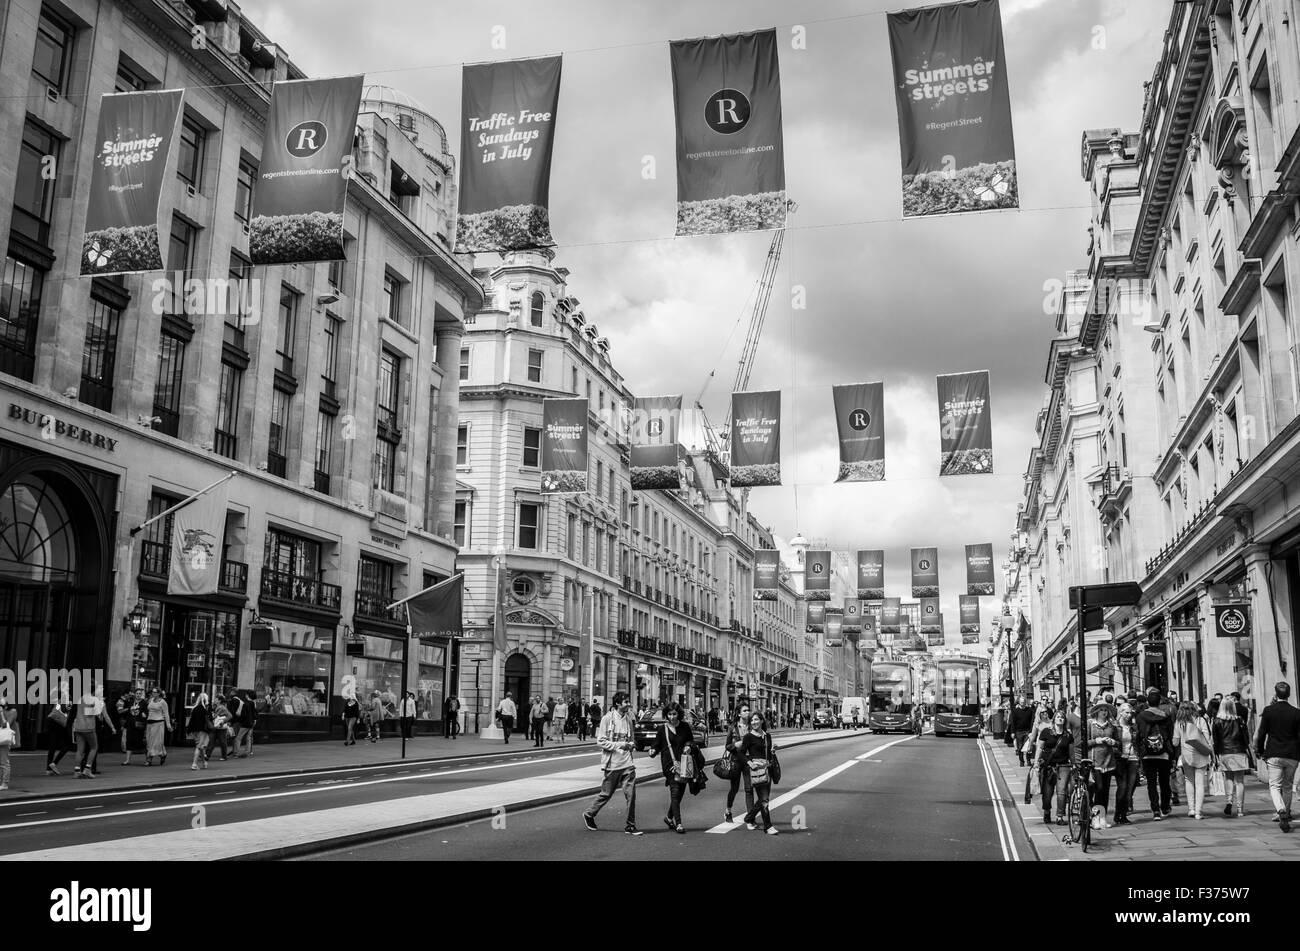 Oxford Street in London - Stock Image